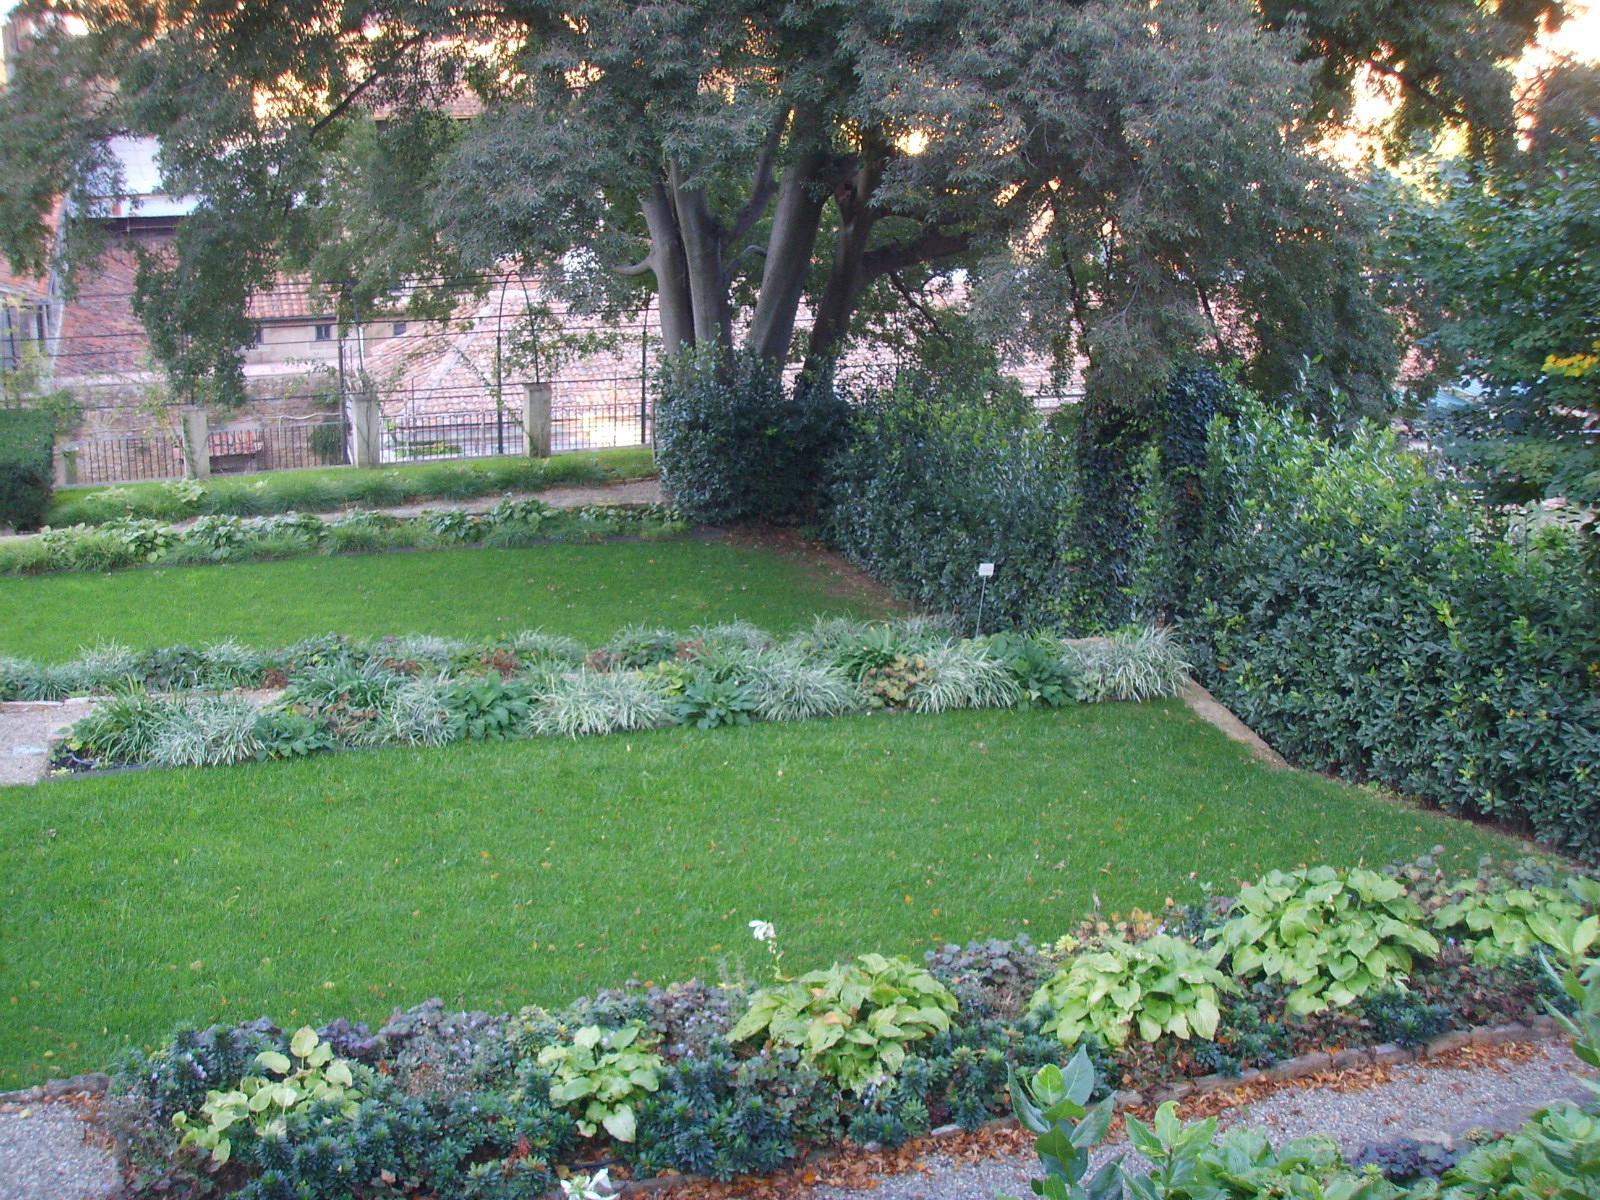 File:Giardino bardini, terrazzamento 05.JPG - Wikipedia